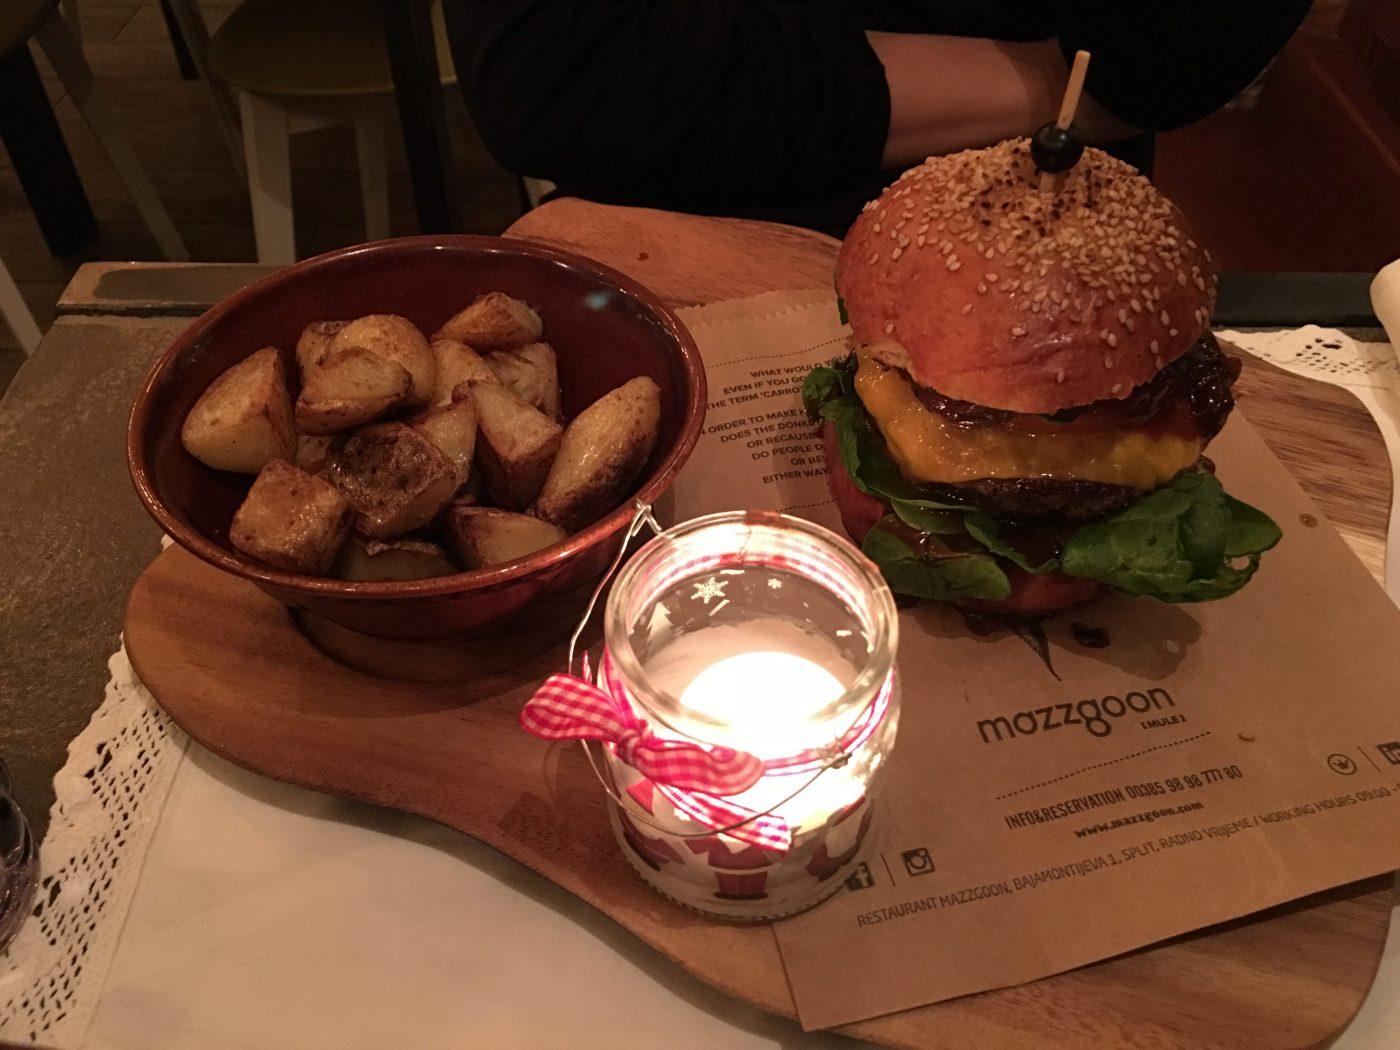 where to eat in split croatia mazgoon restaurant